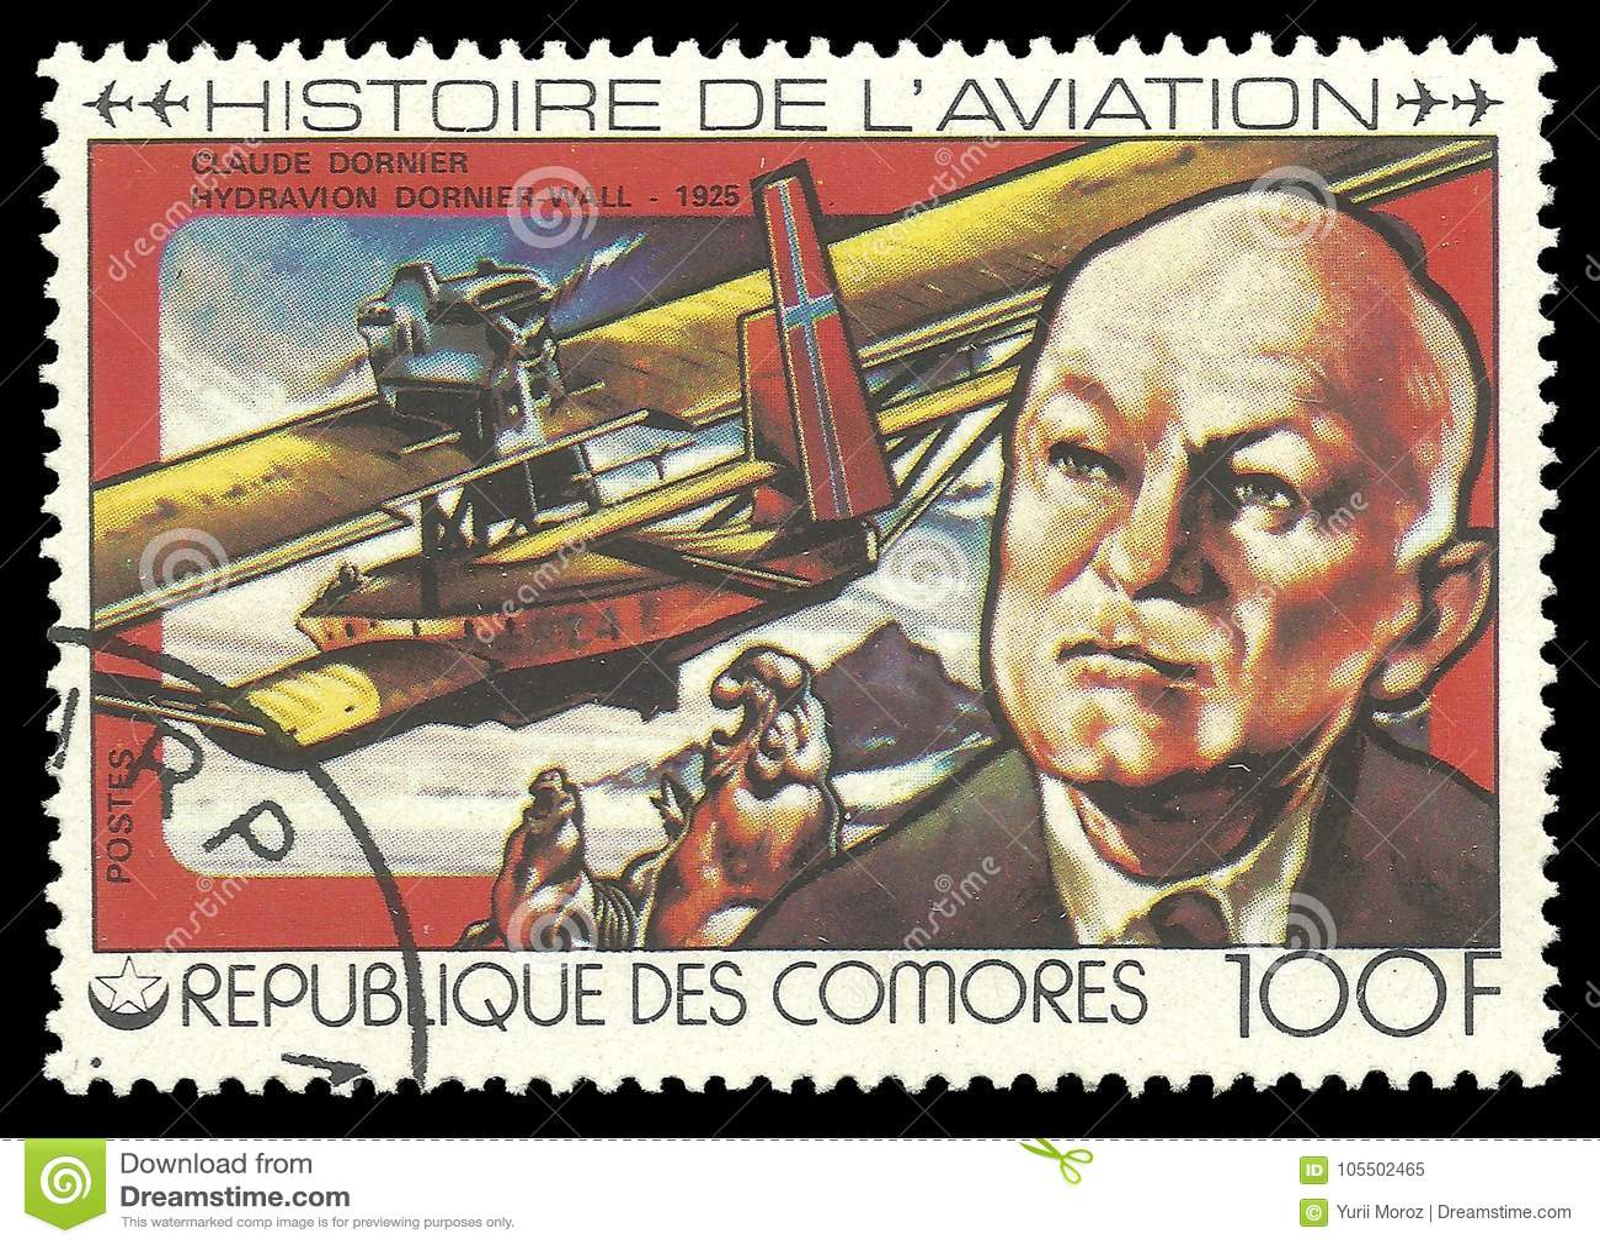 Luftfahrt-Geschichte, Claude Dornier